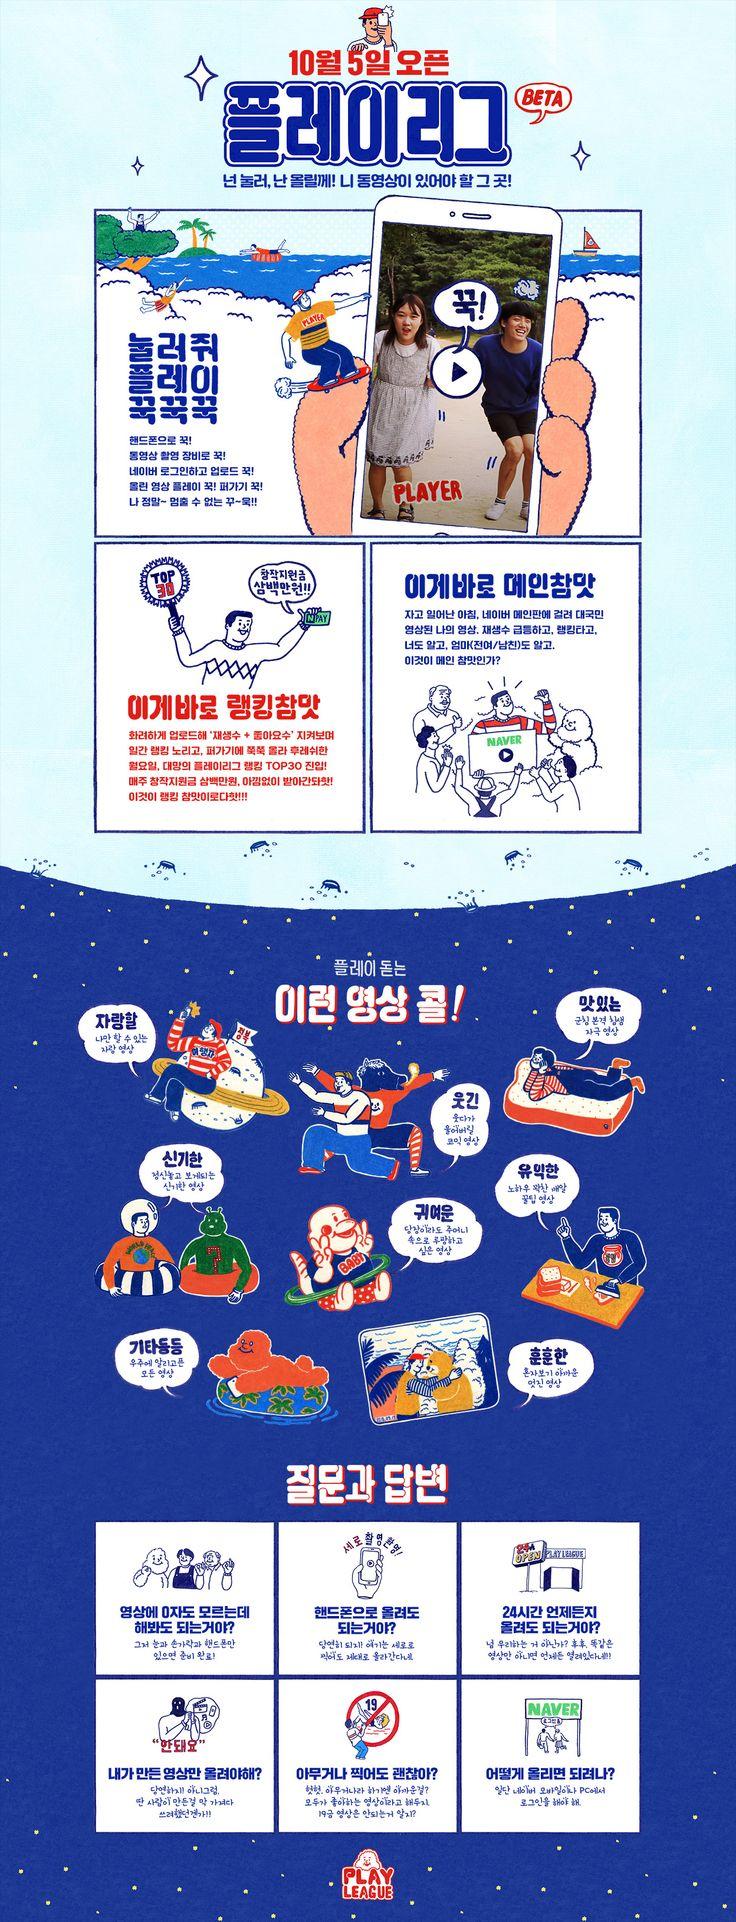 Play League - Naver Cast